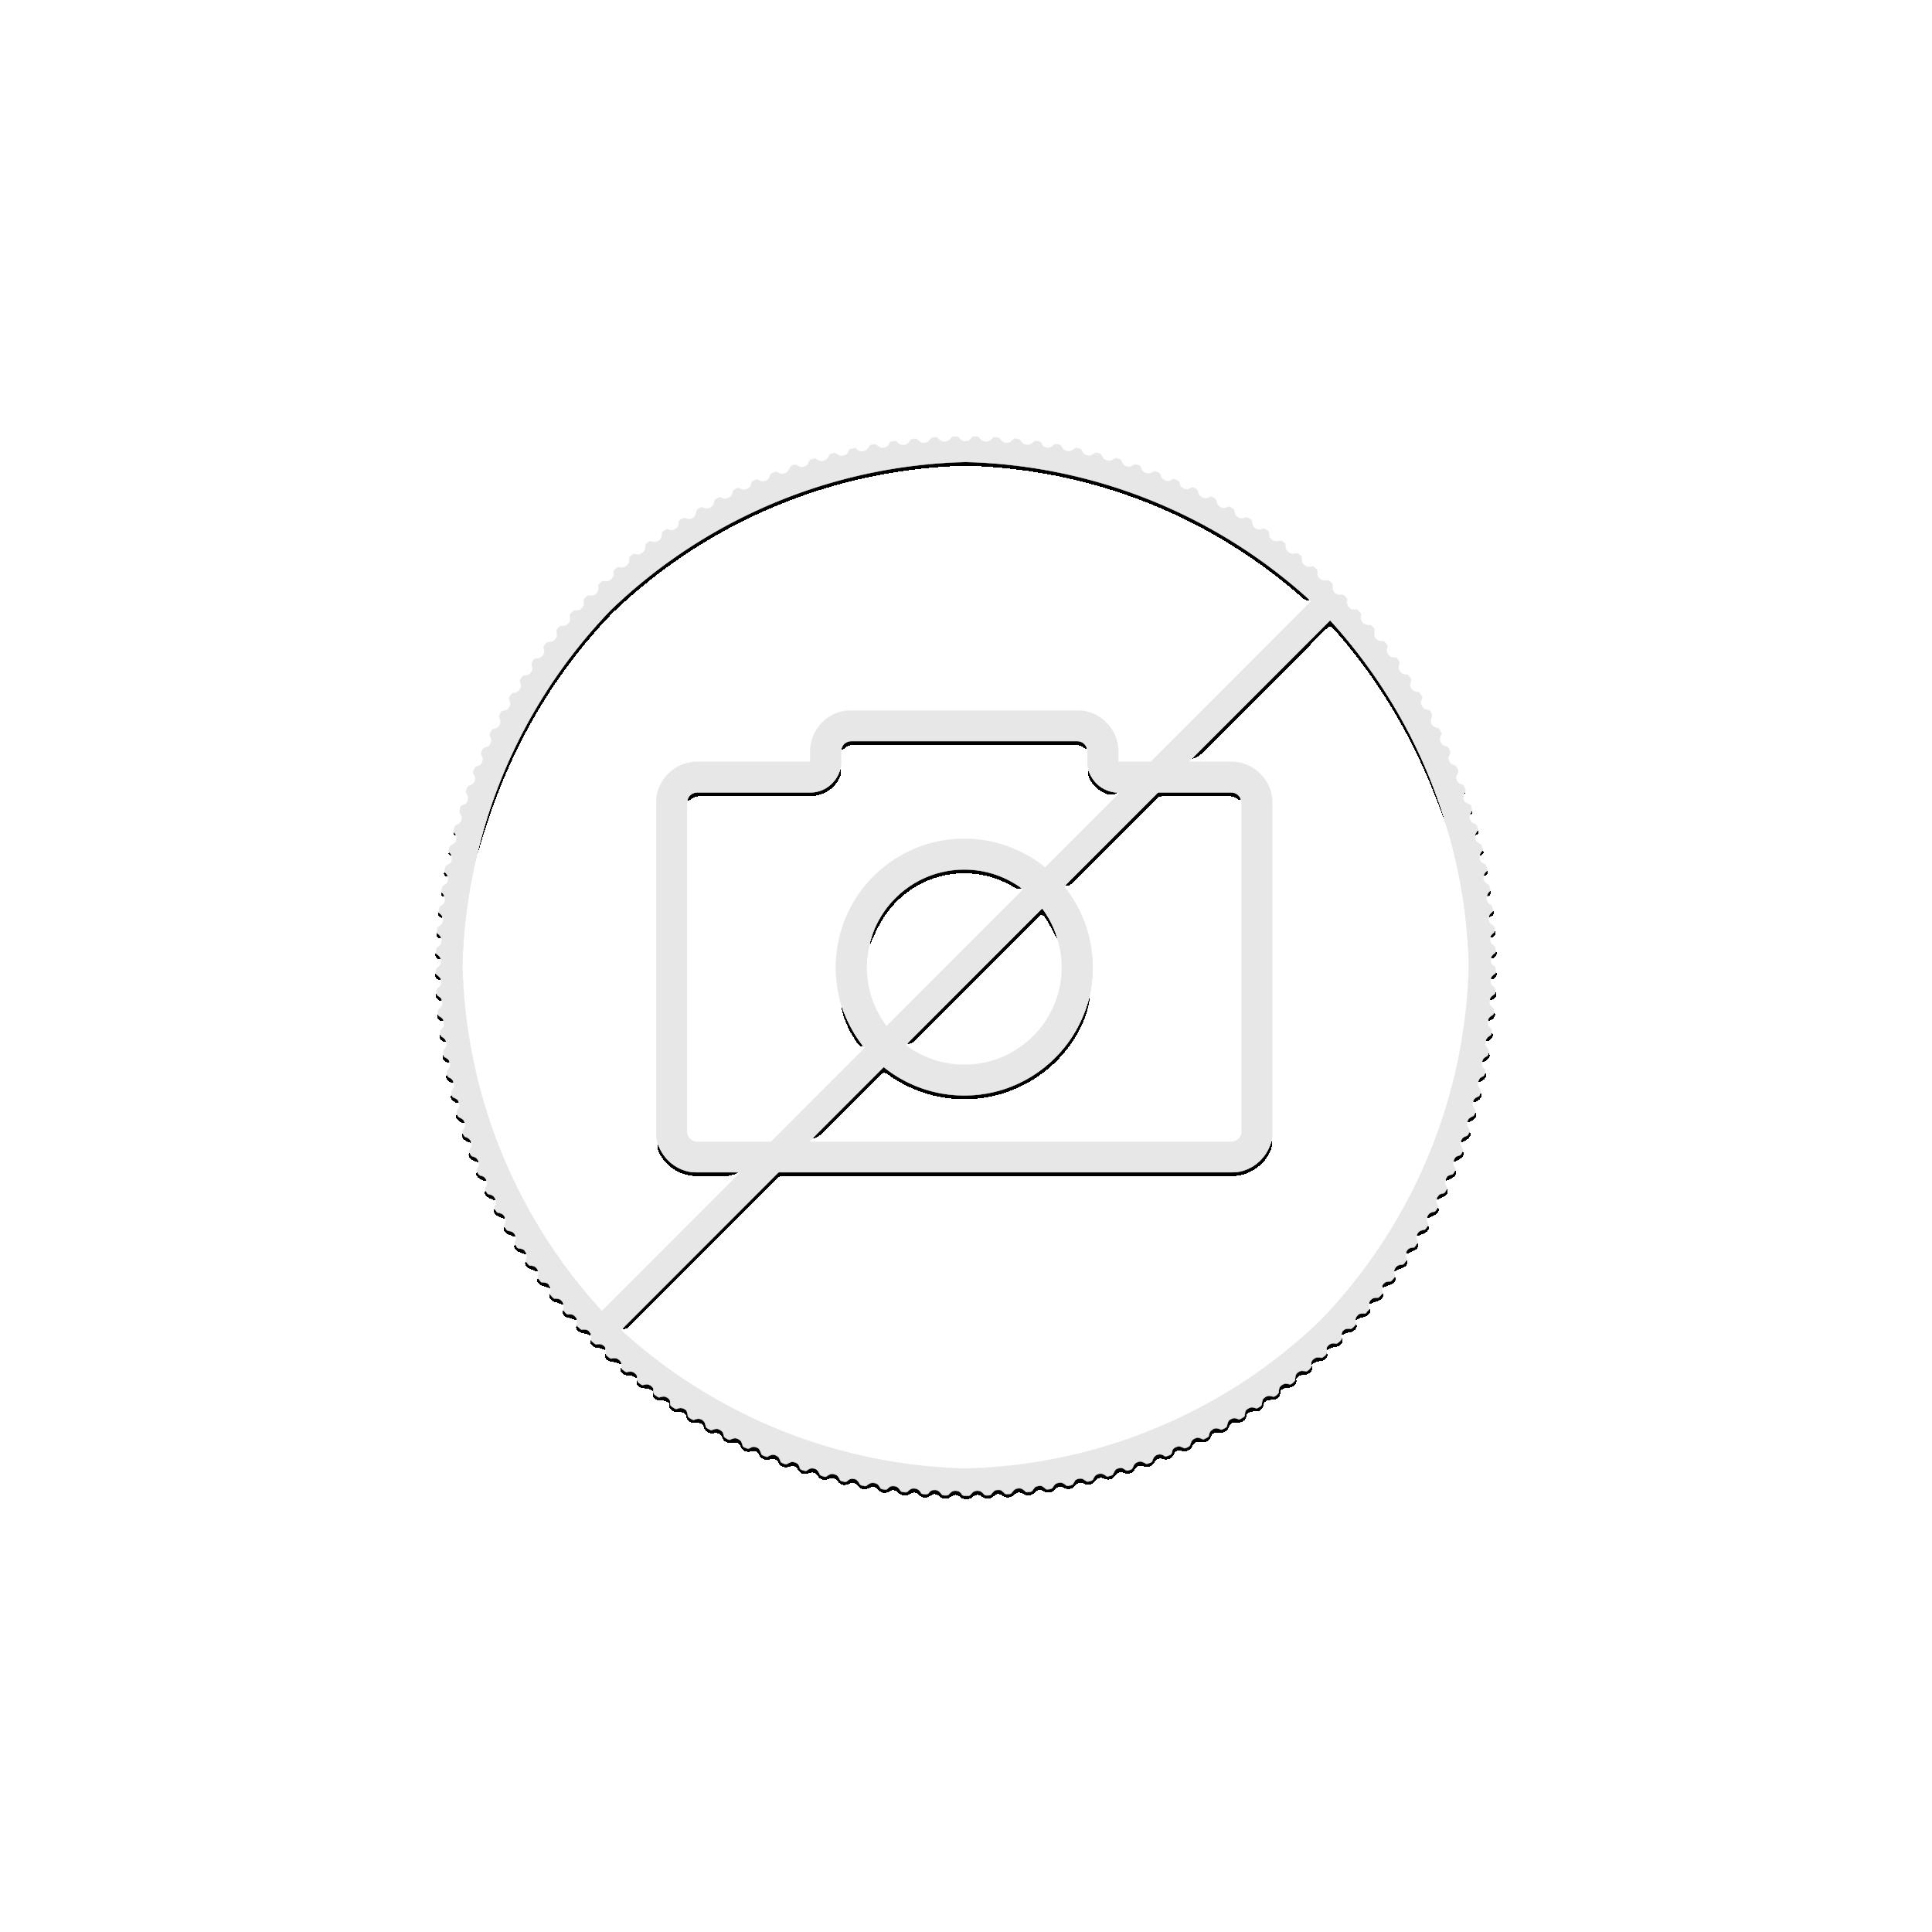 1 Troy ounce zilveren munt Krugerrand 2021